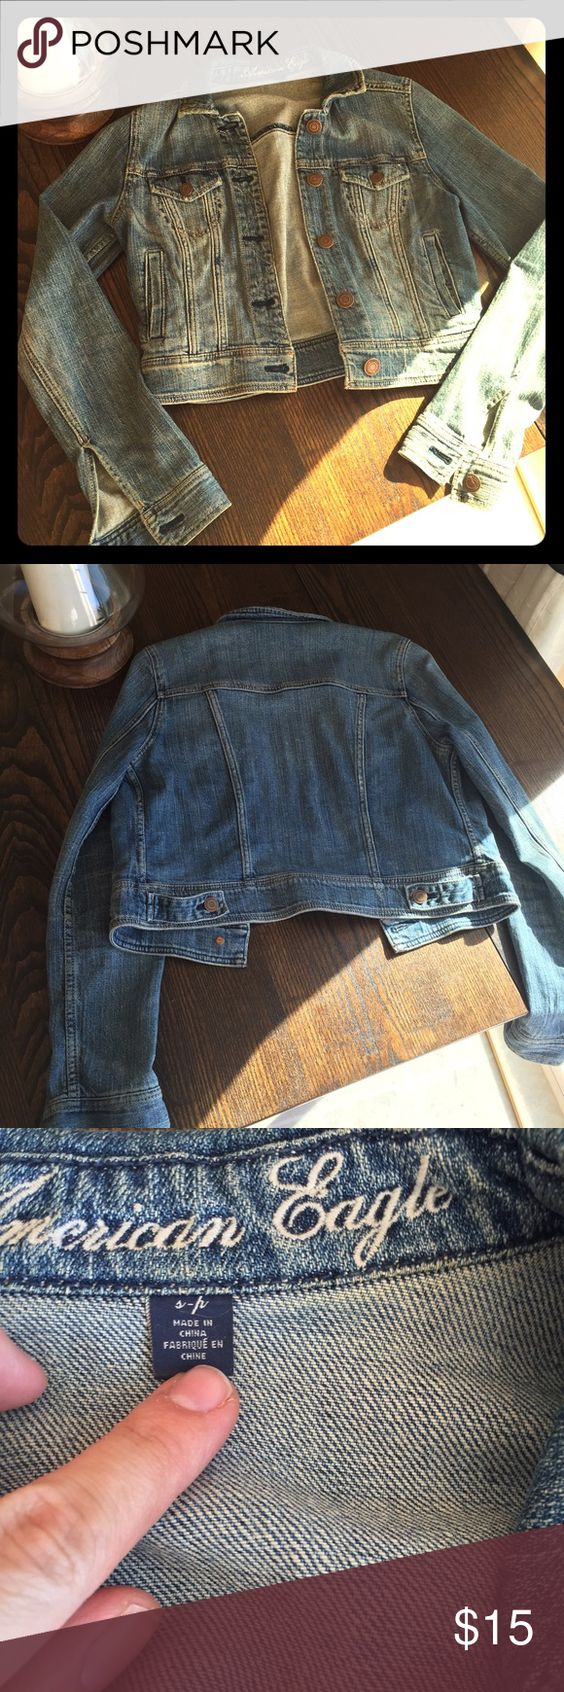 Denim jacket American eagle denim jacket American Eagle Outfitters Jackets & Coats Jean Jackets